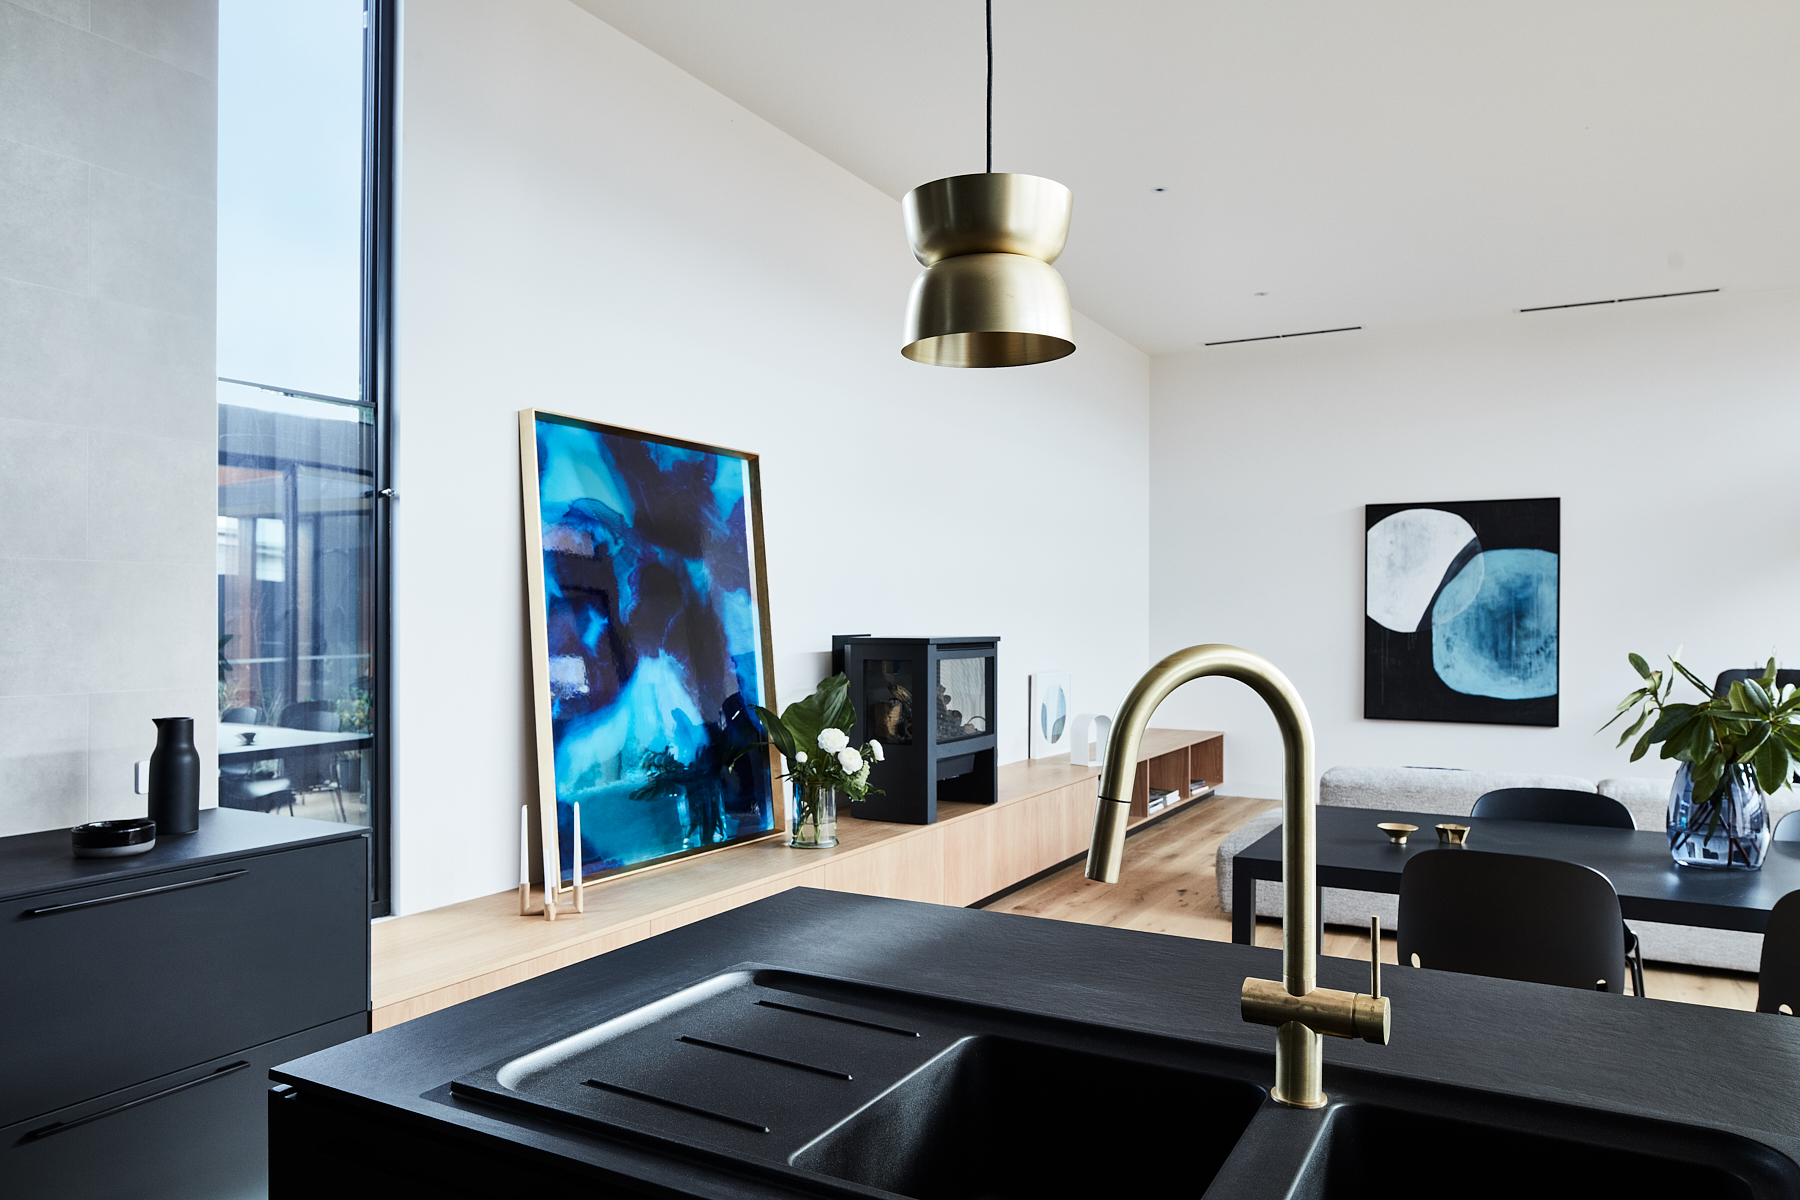 THE DETAILS °Sofflo Dining Table + Intro Dining Chairs  @piancadesign  Match XL sofa + Mono side table: @prostoria  °Large leaning art: Megan Weston  @mwestonart  °Hanging art: KimmiLee art: @kimmilee_art  ° @sussextaps  @haymespaint  @rylockaustralia  @airsmart_au   @hurfordwholesale